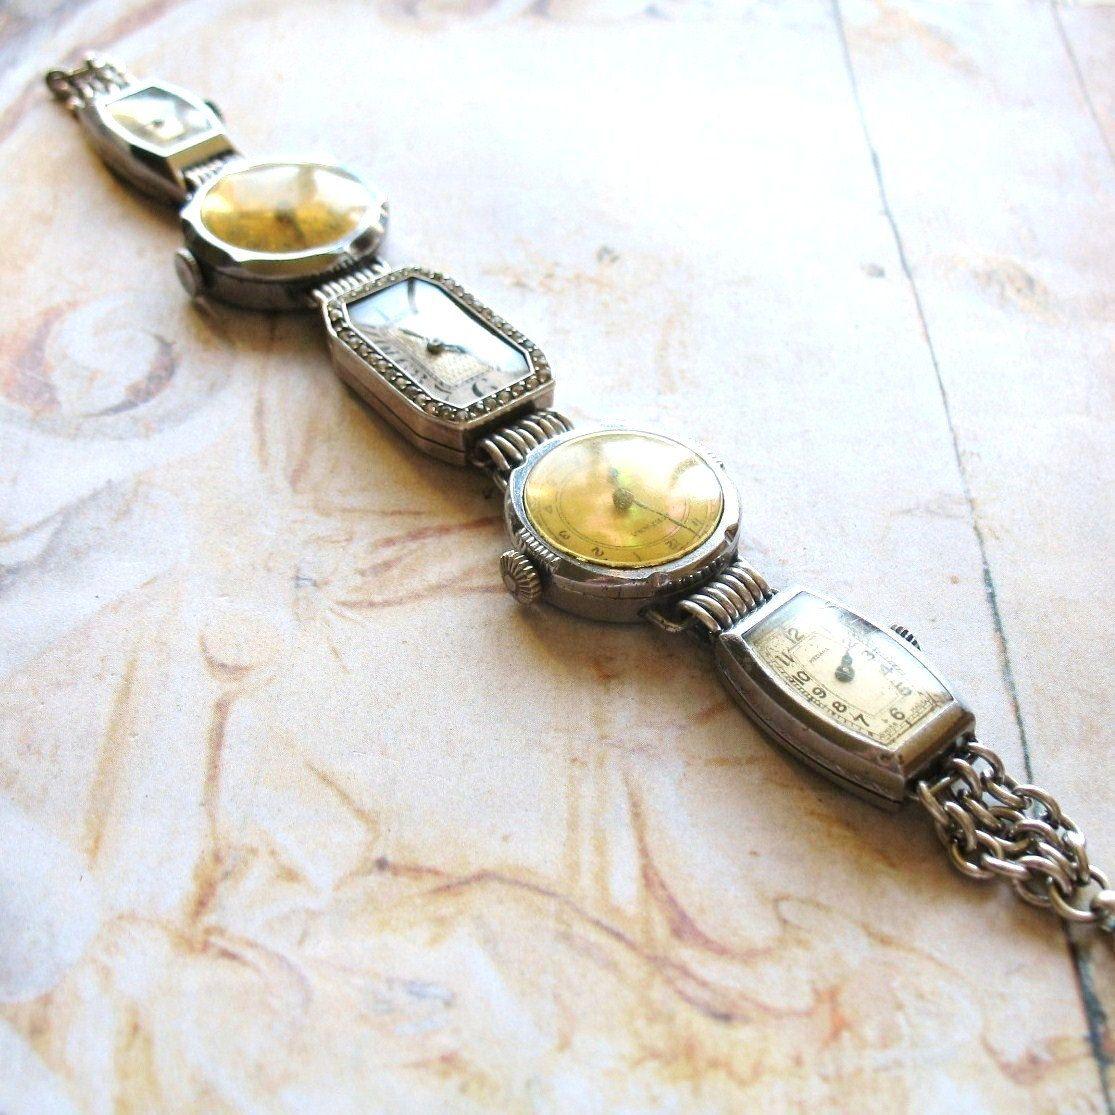 Past Times - Vintage Art Deco Handmade Watch Bracelet